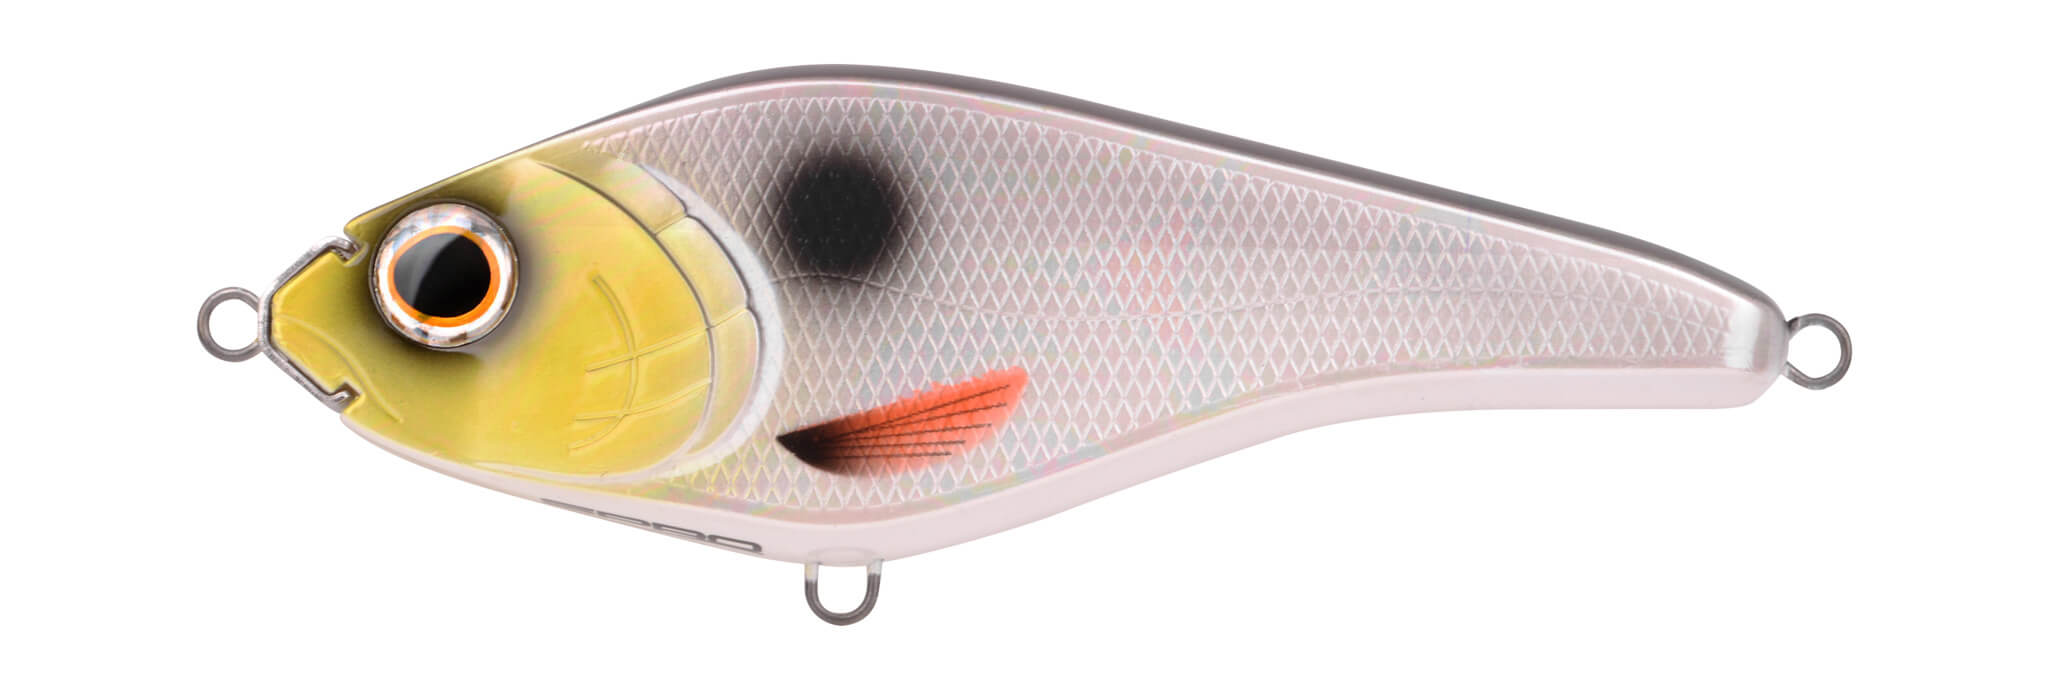 Blog - The Rapper - UV Silverfish